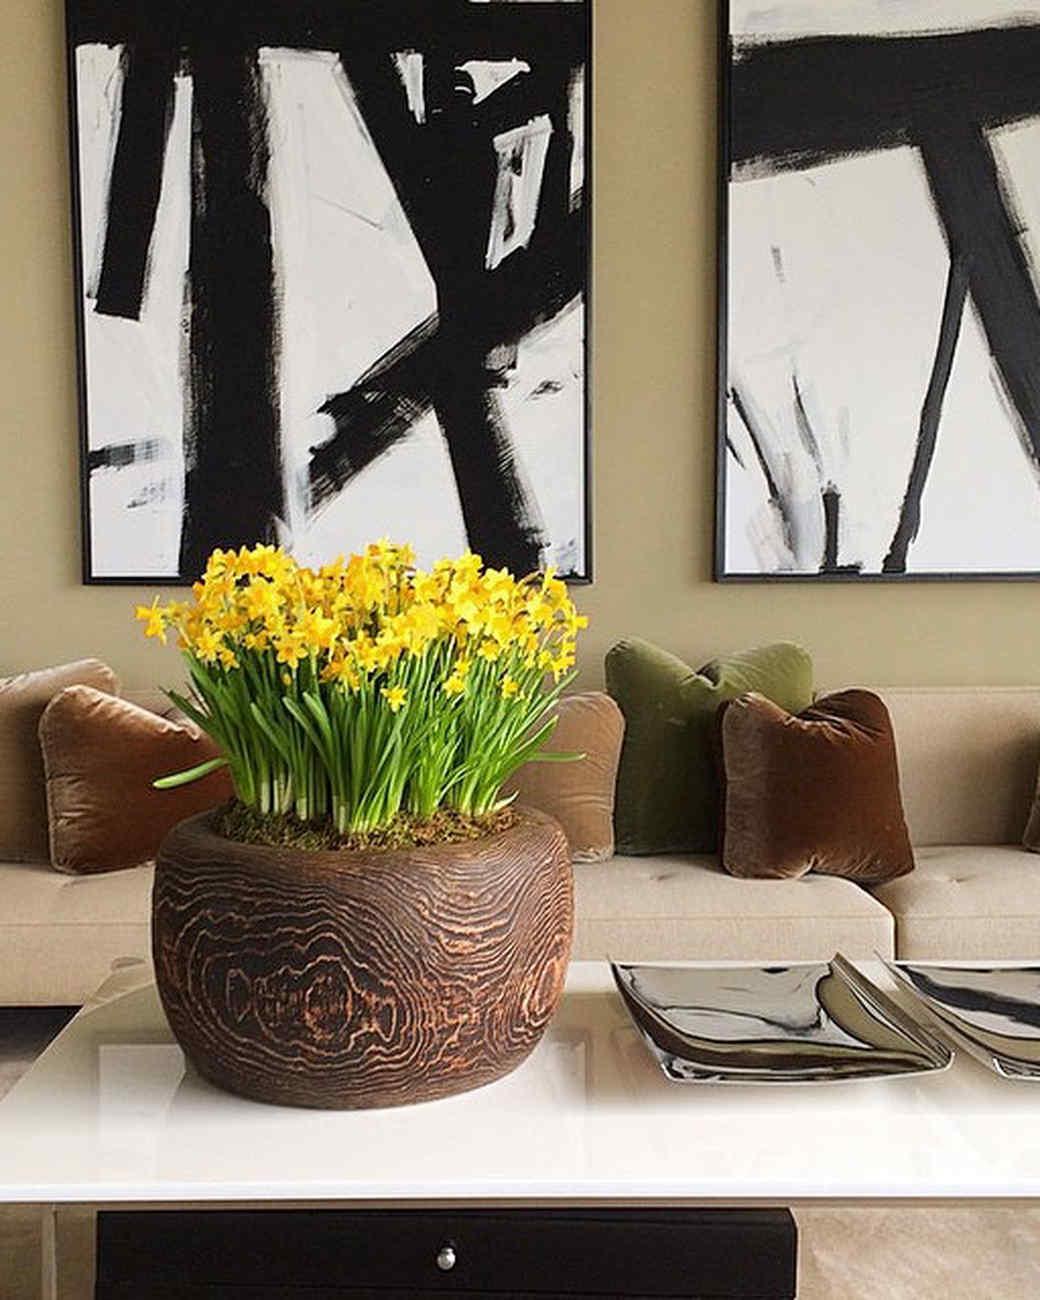 sharkey-instagram-yellow-tulips.jpg